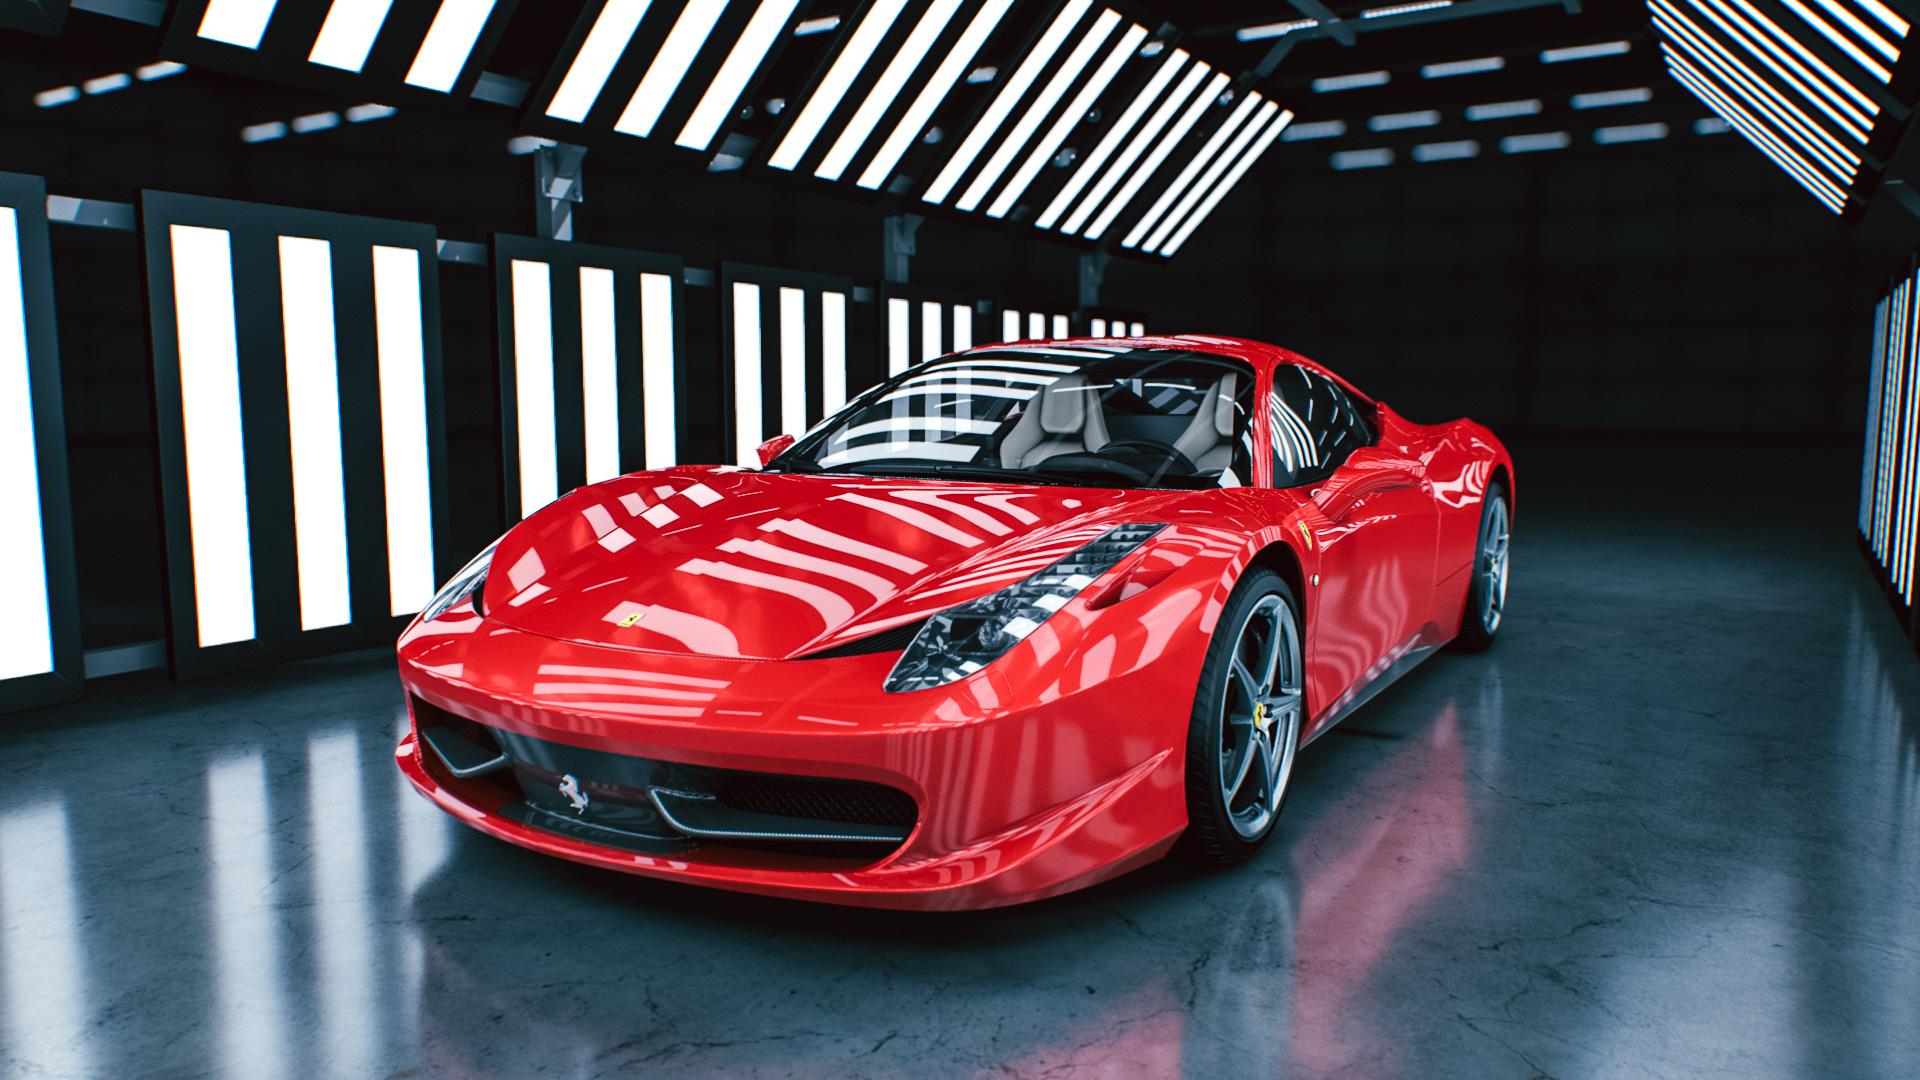 cinema 4d car textures